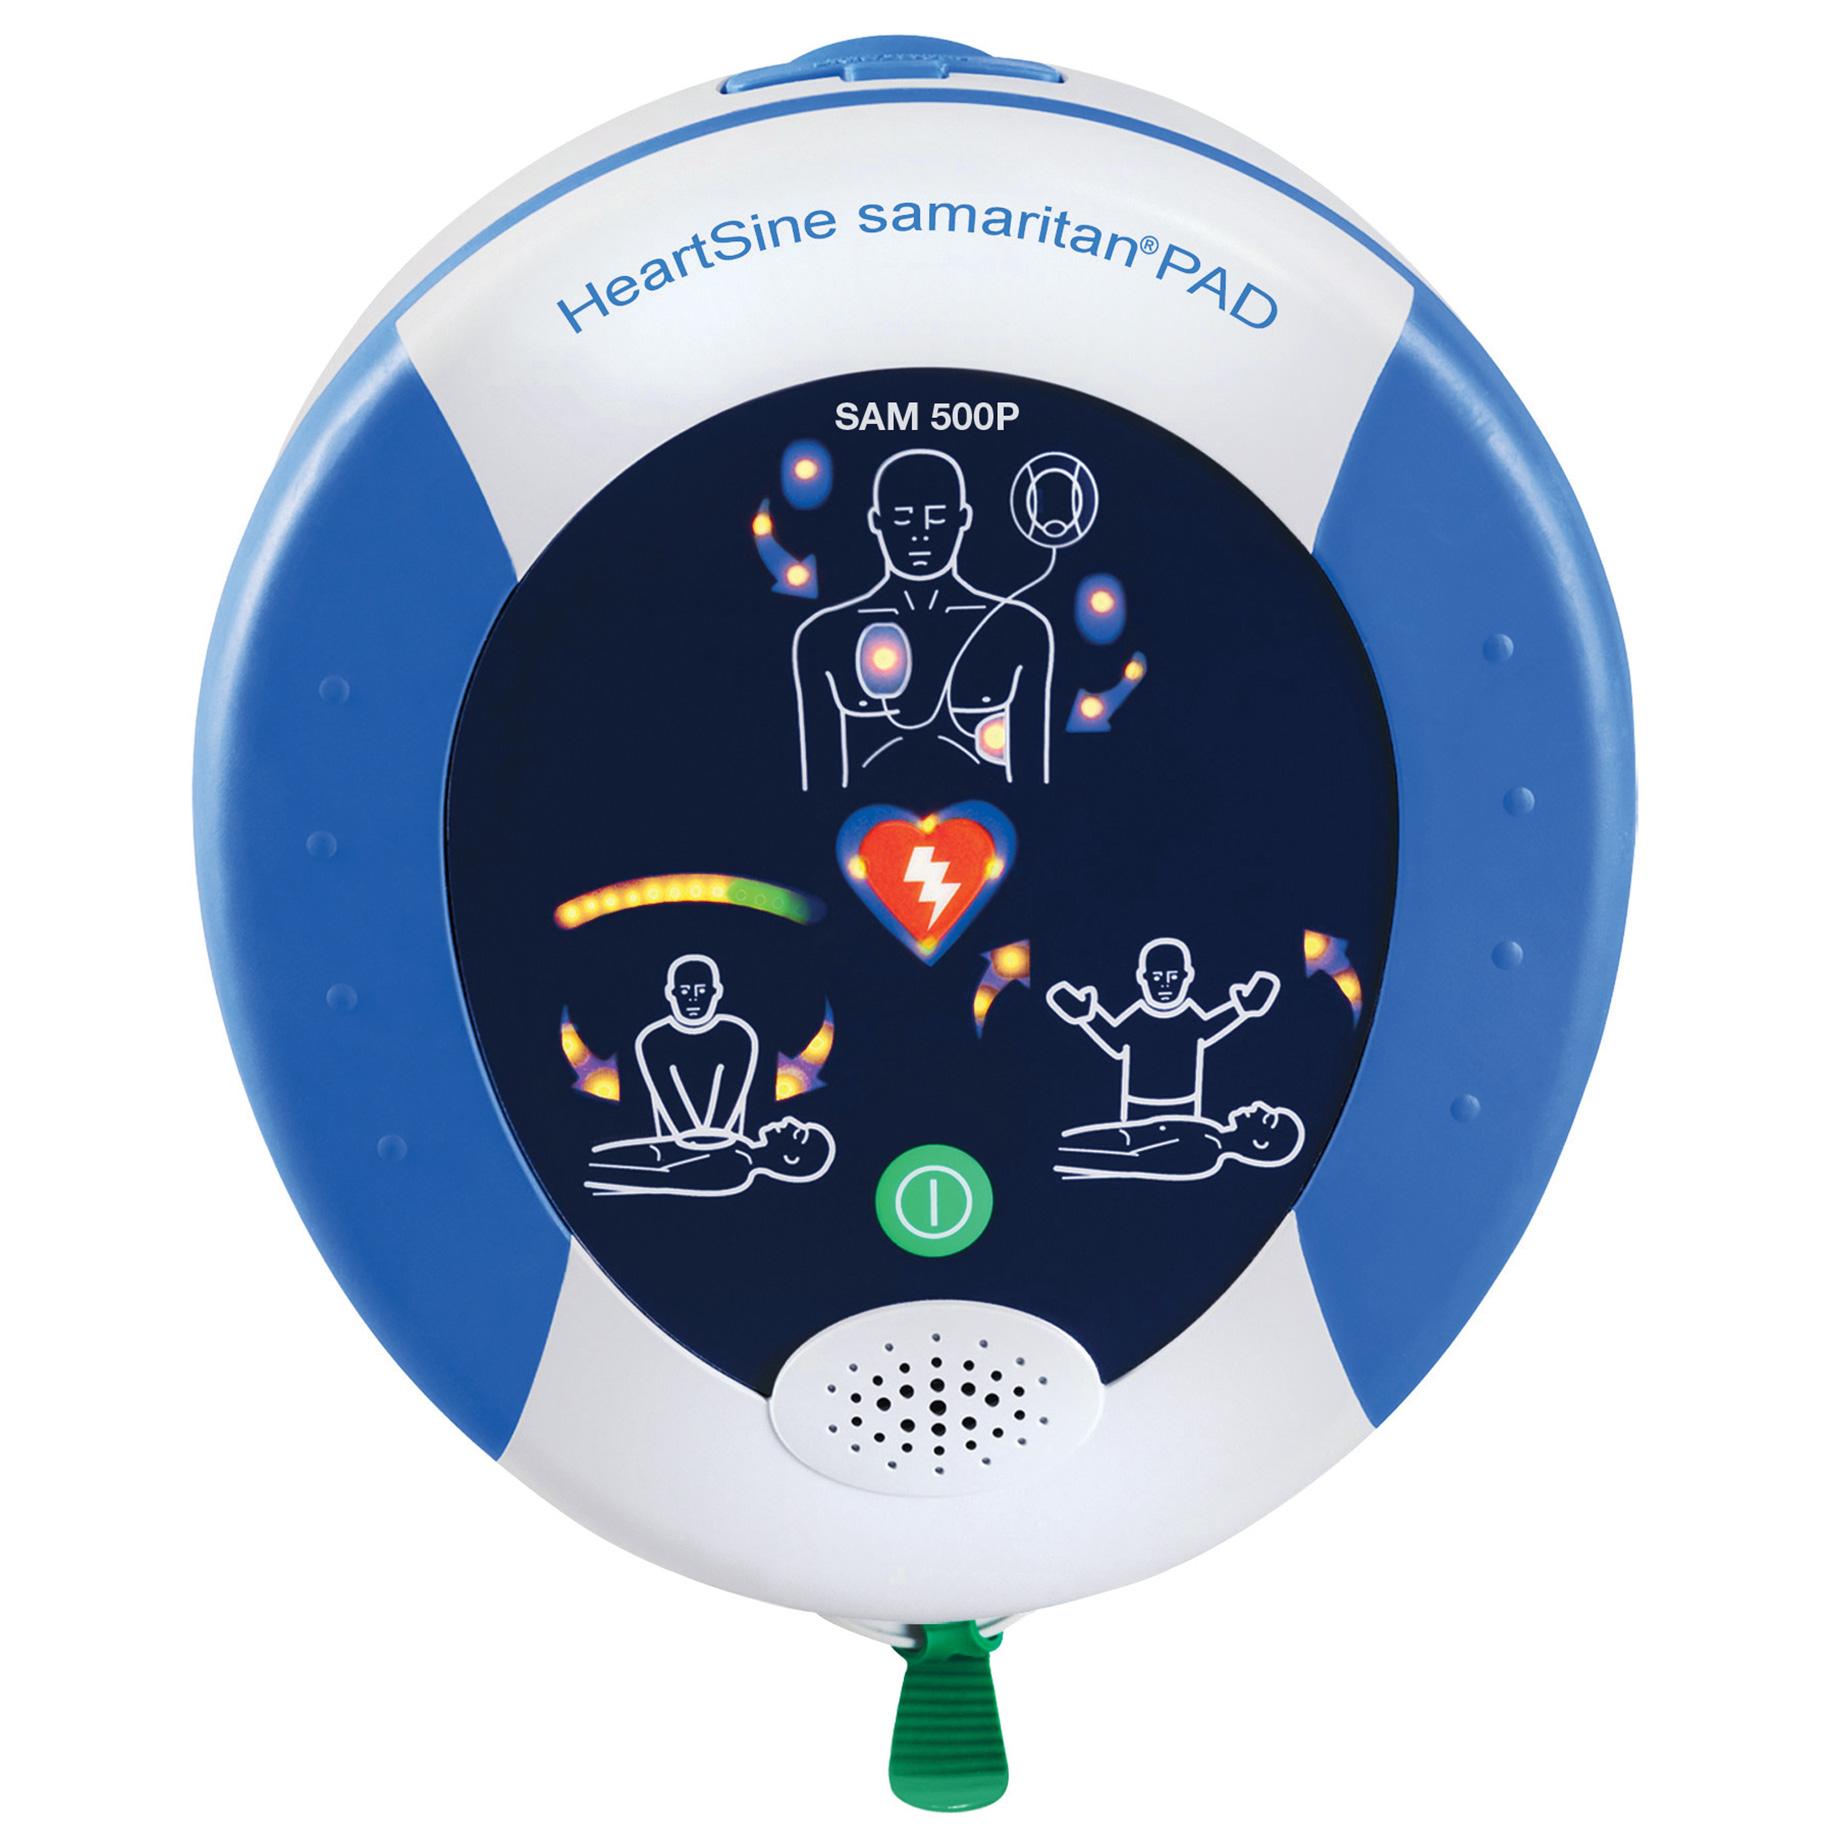 HeartSine Samaritan PAD 500P CPR Advisor